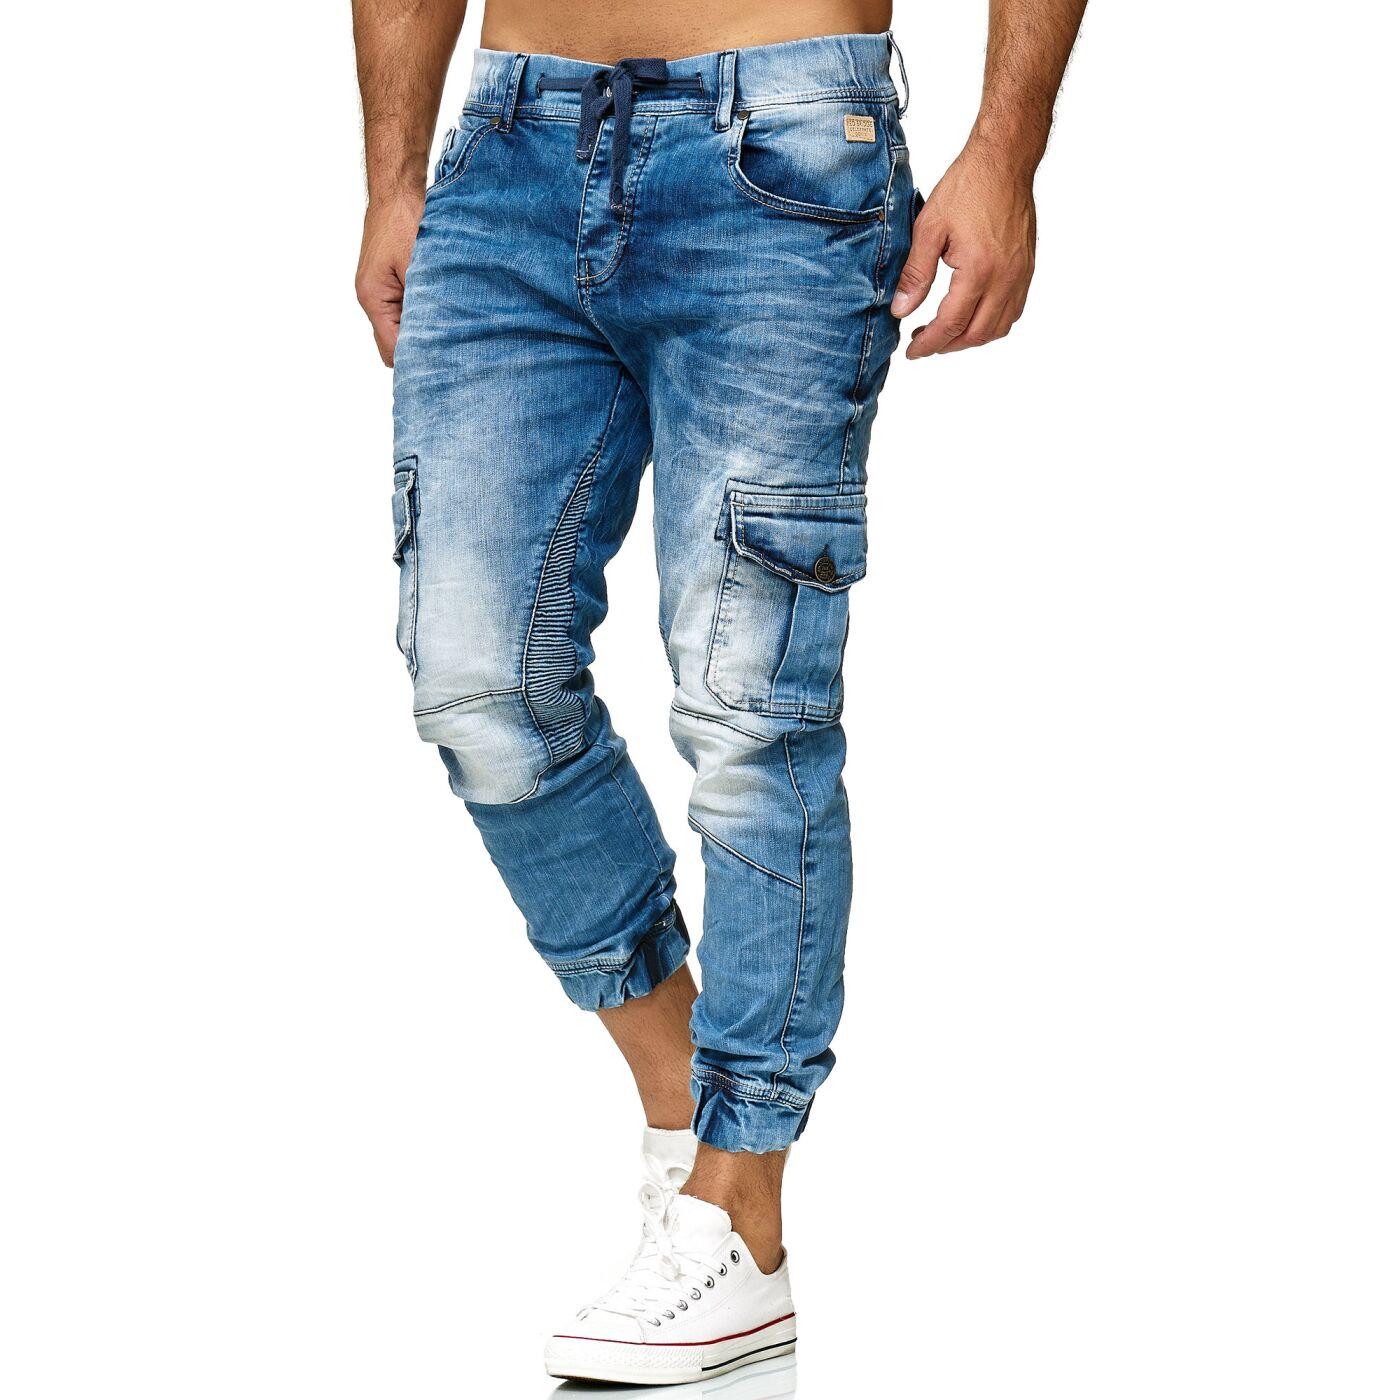 e3e281077b7379 Red Bridge Herren Jogger Denim Jeanshose Cargo Hose Narrow Leg Jeans  schmales Bein